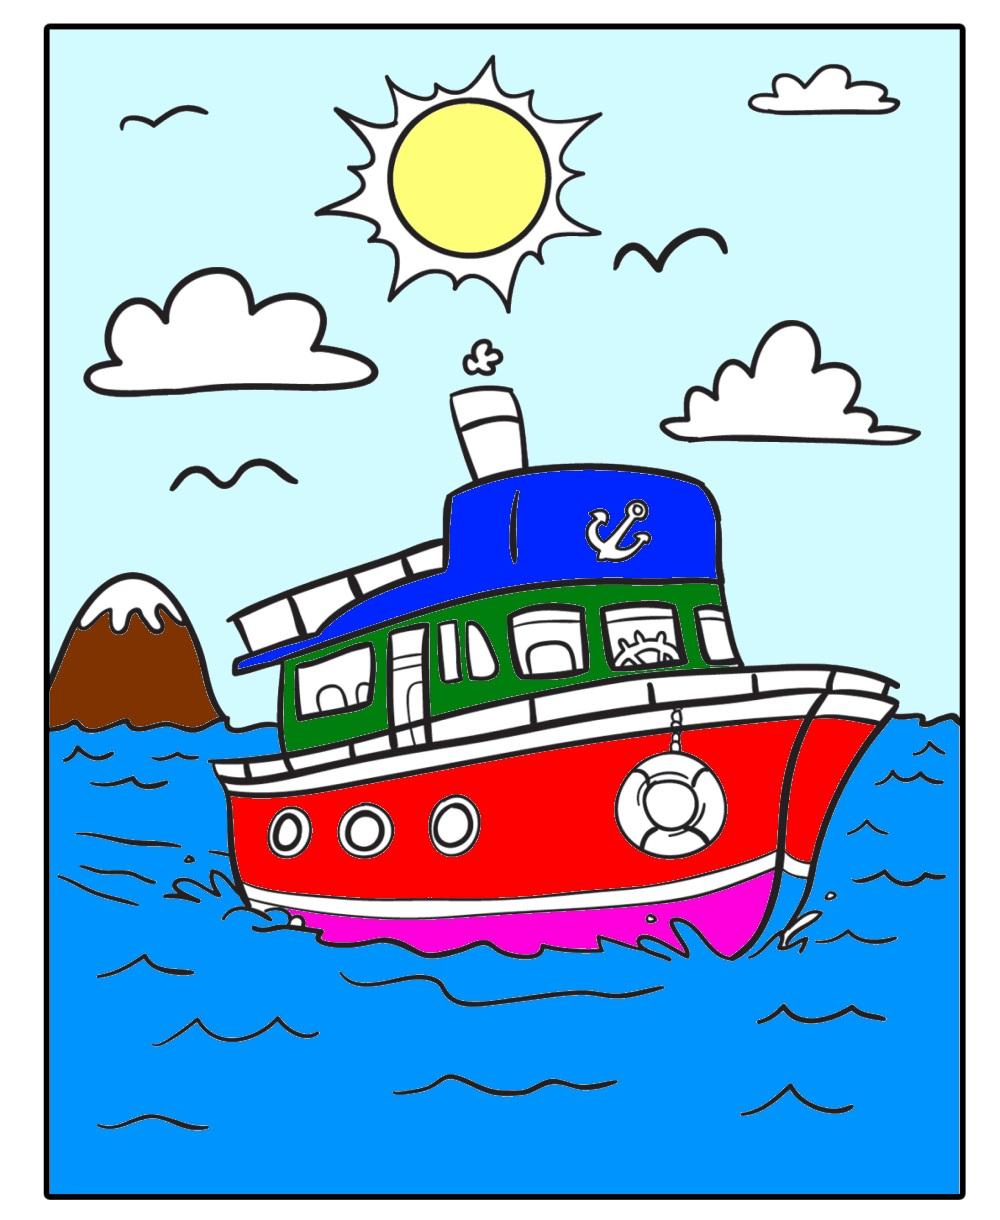 Boat clipart, Boat, Cartoon, Clipart, Graphic, HQ Photo